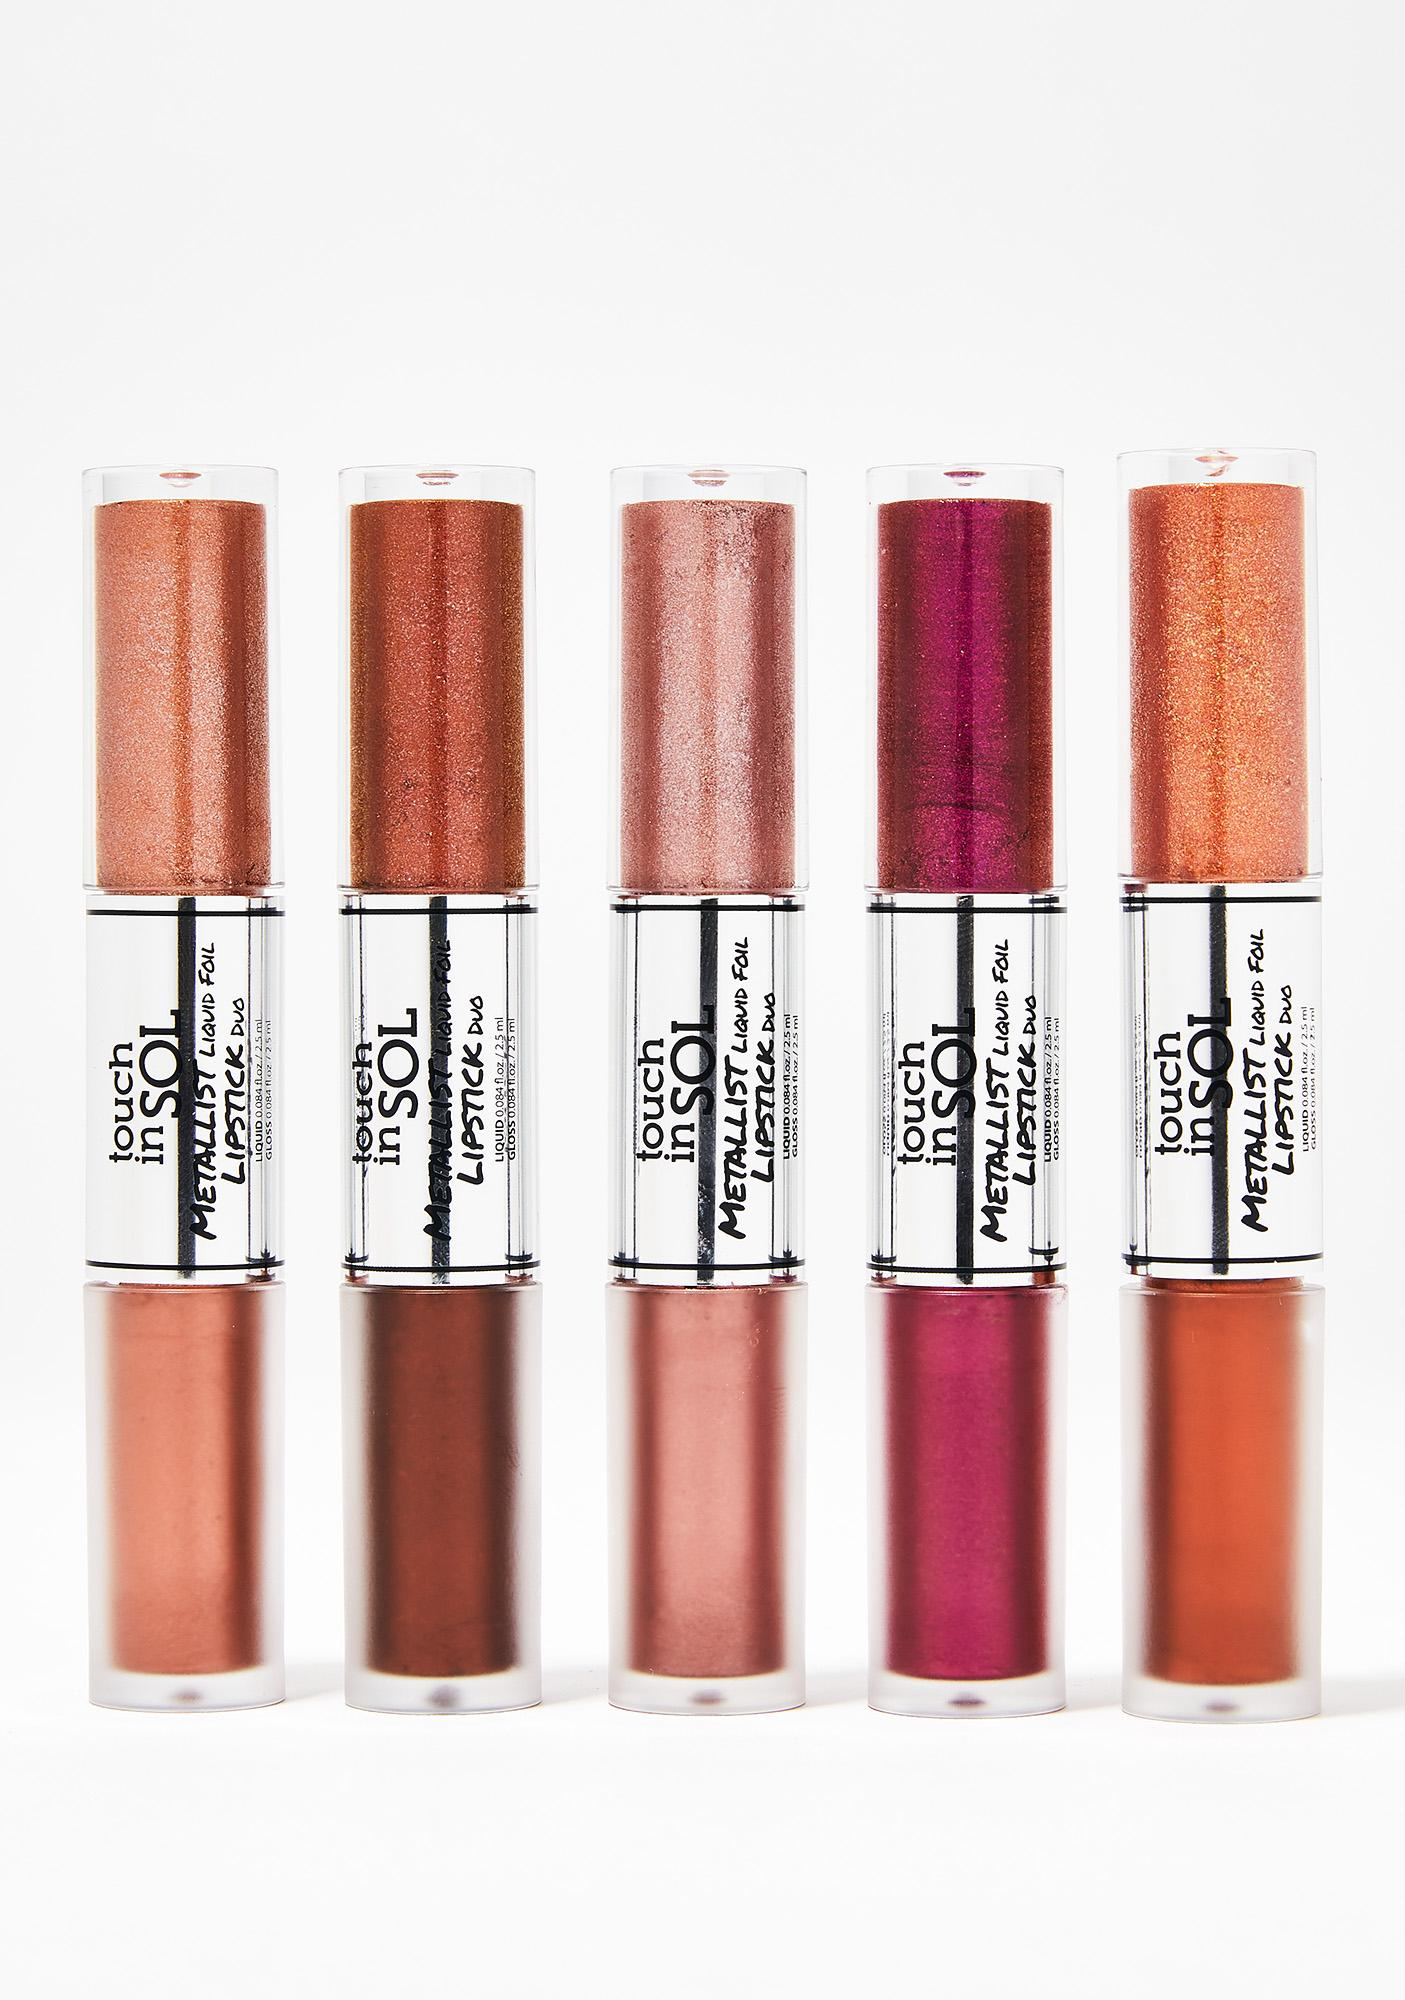 Touch In Sol Maria Metallist Liquid Lipstick Duo